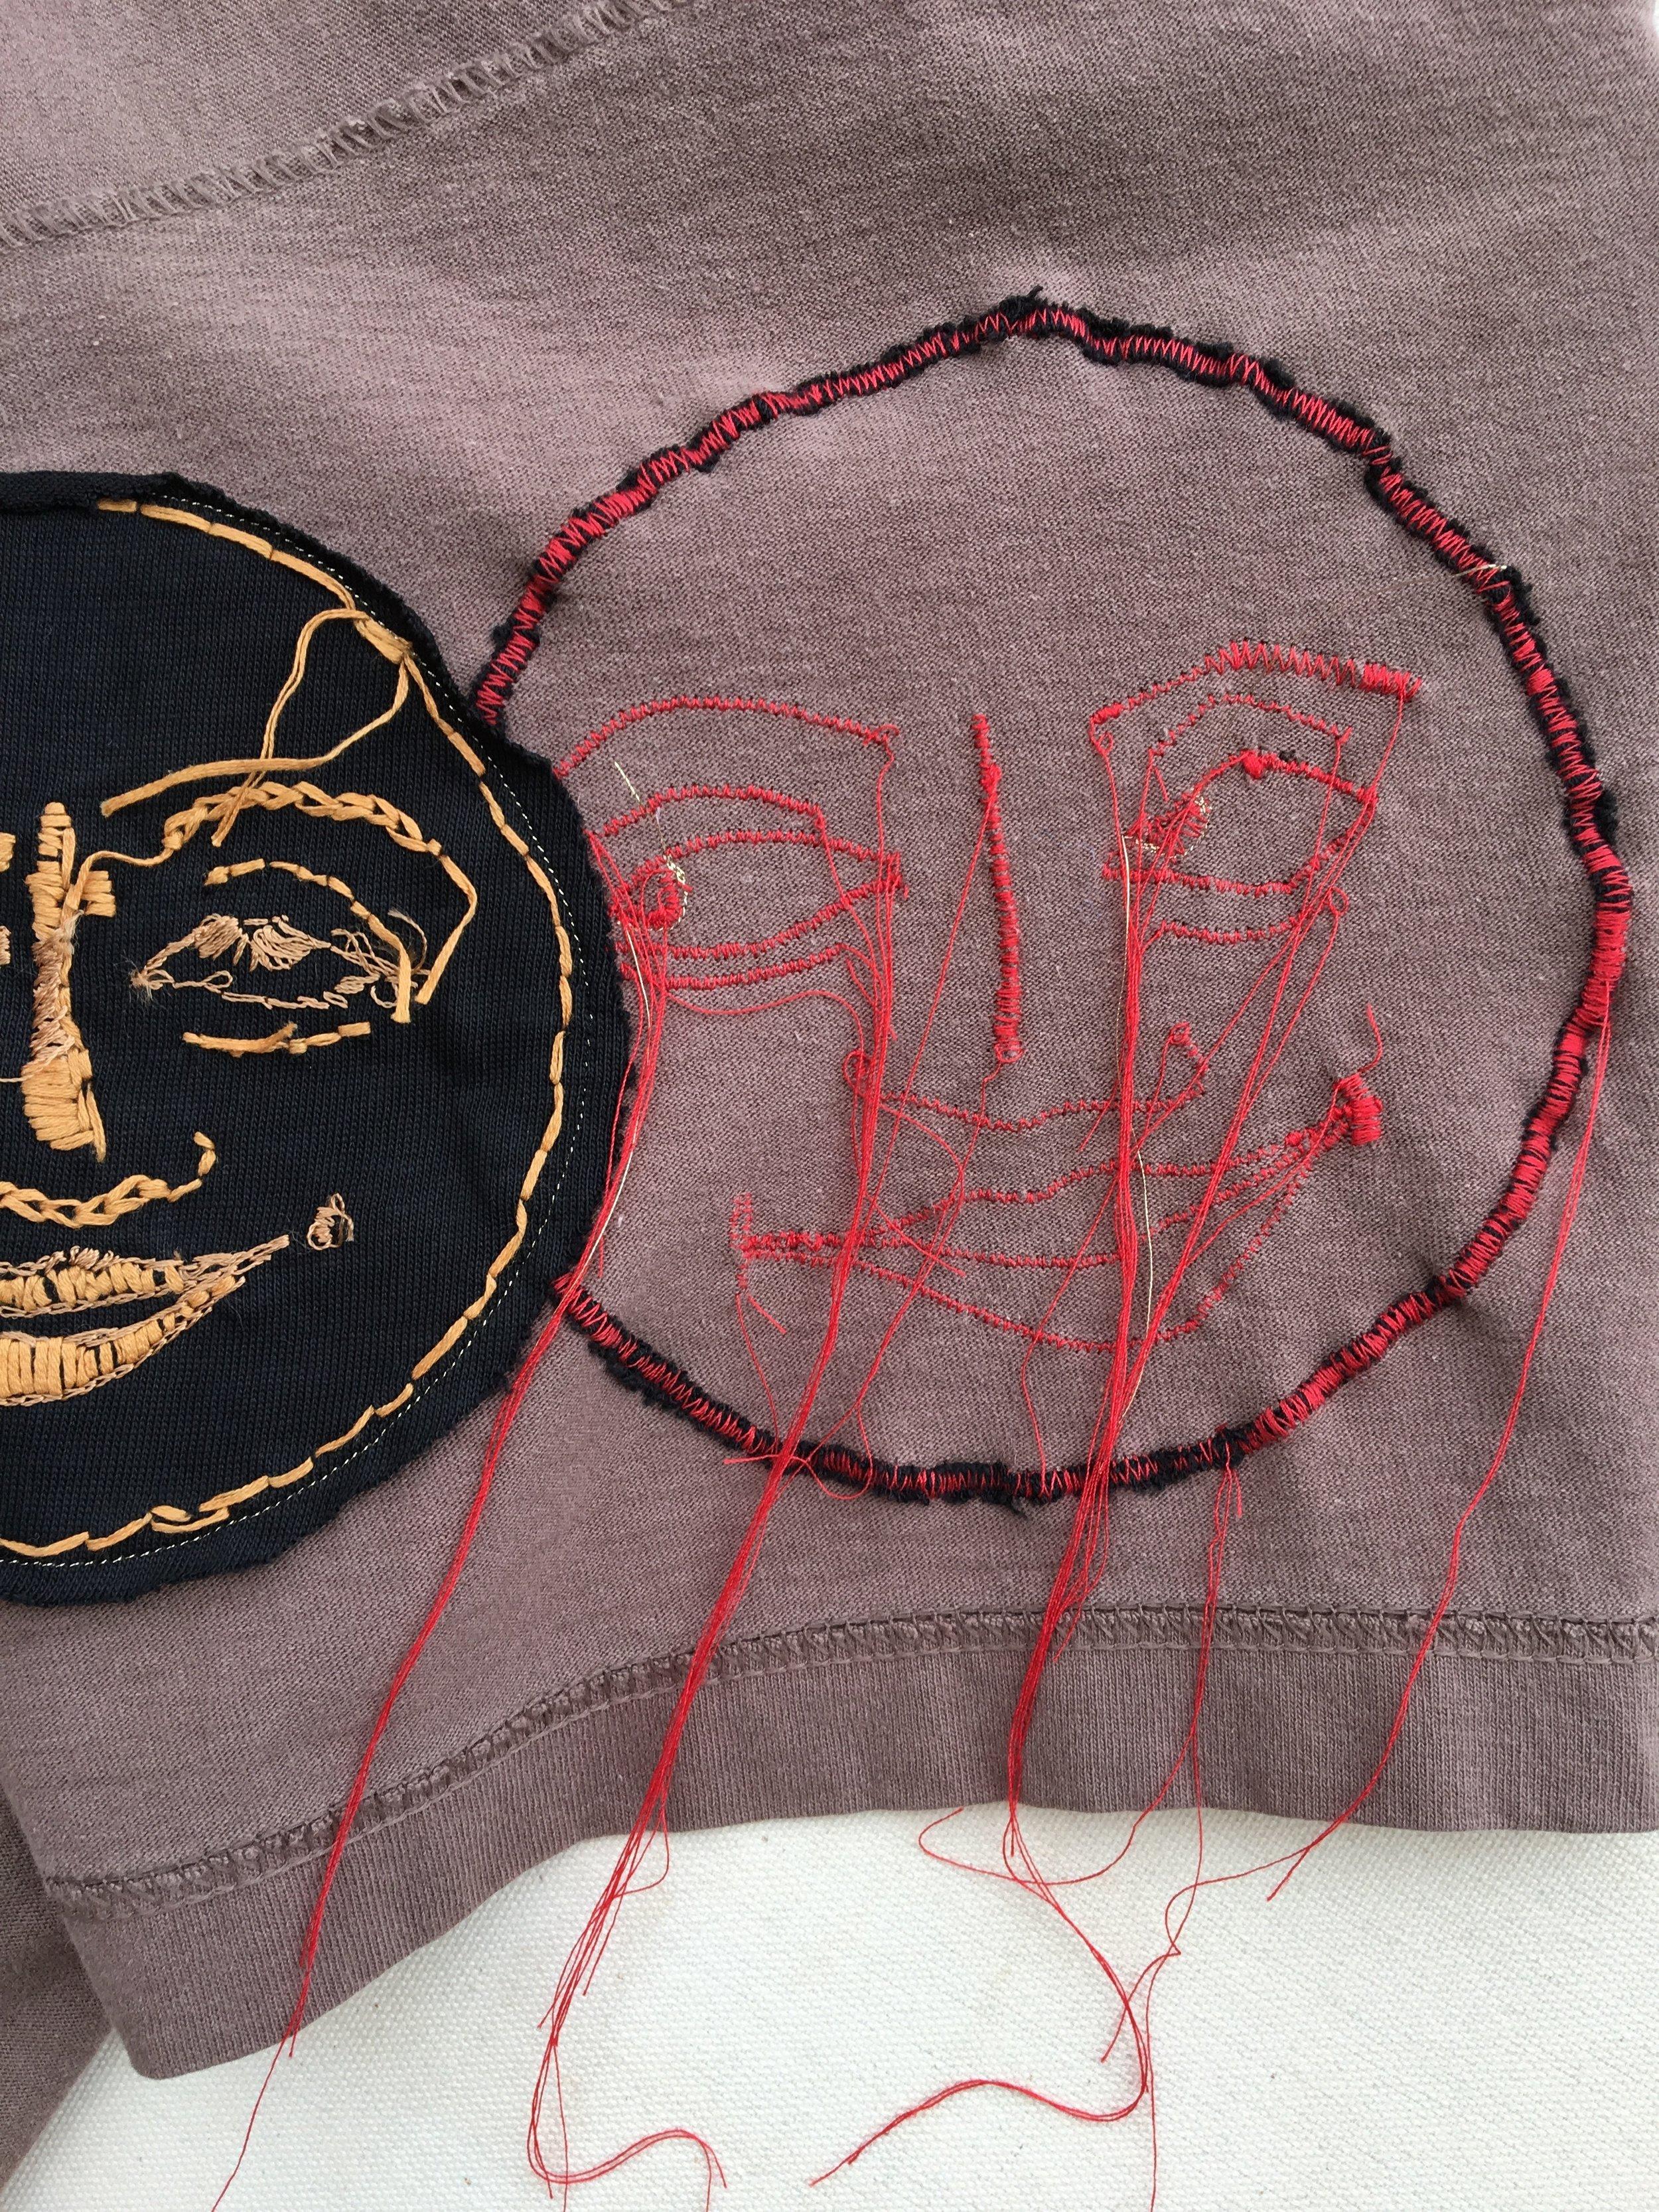 shirt 22_sleeve details.JPG